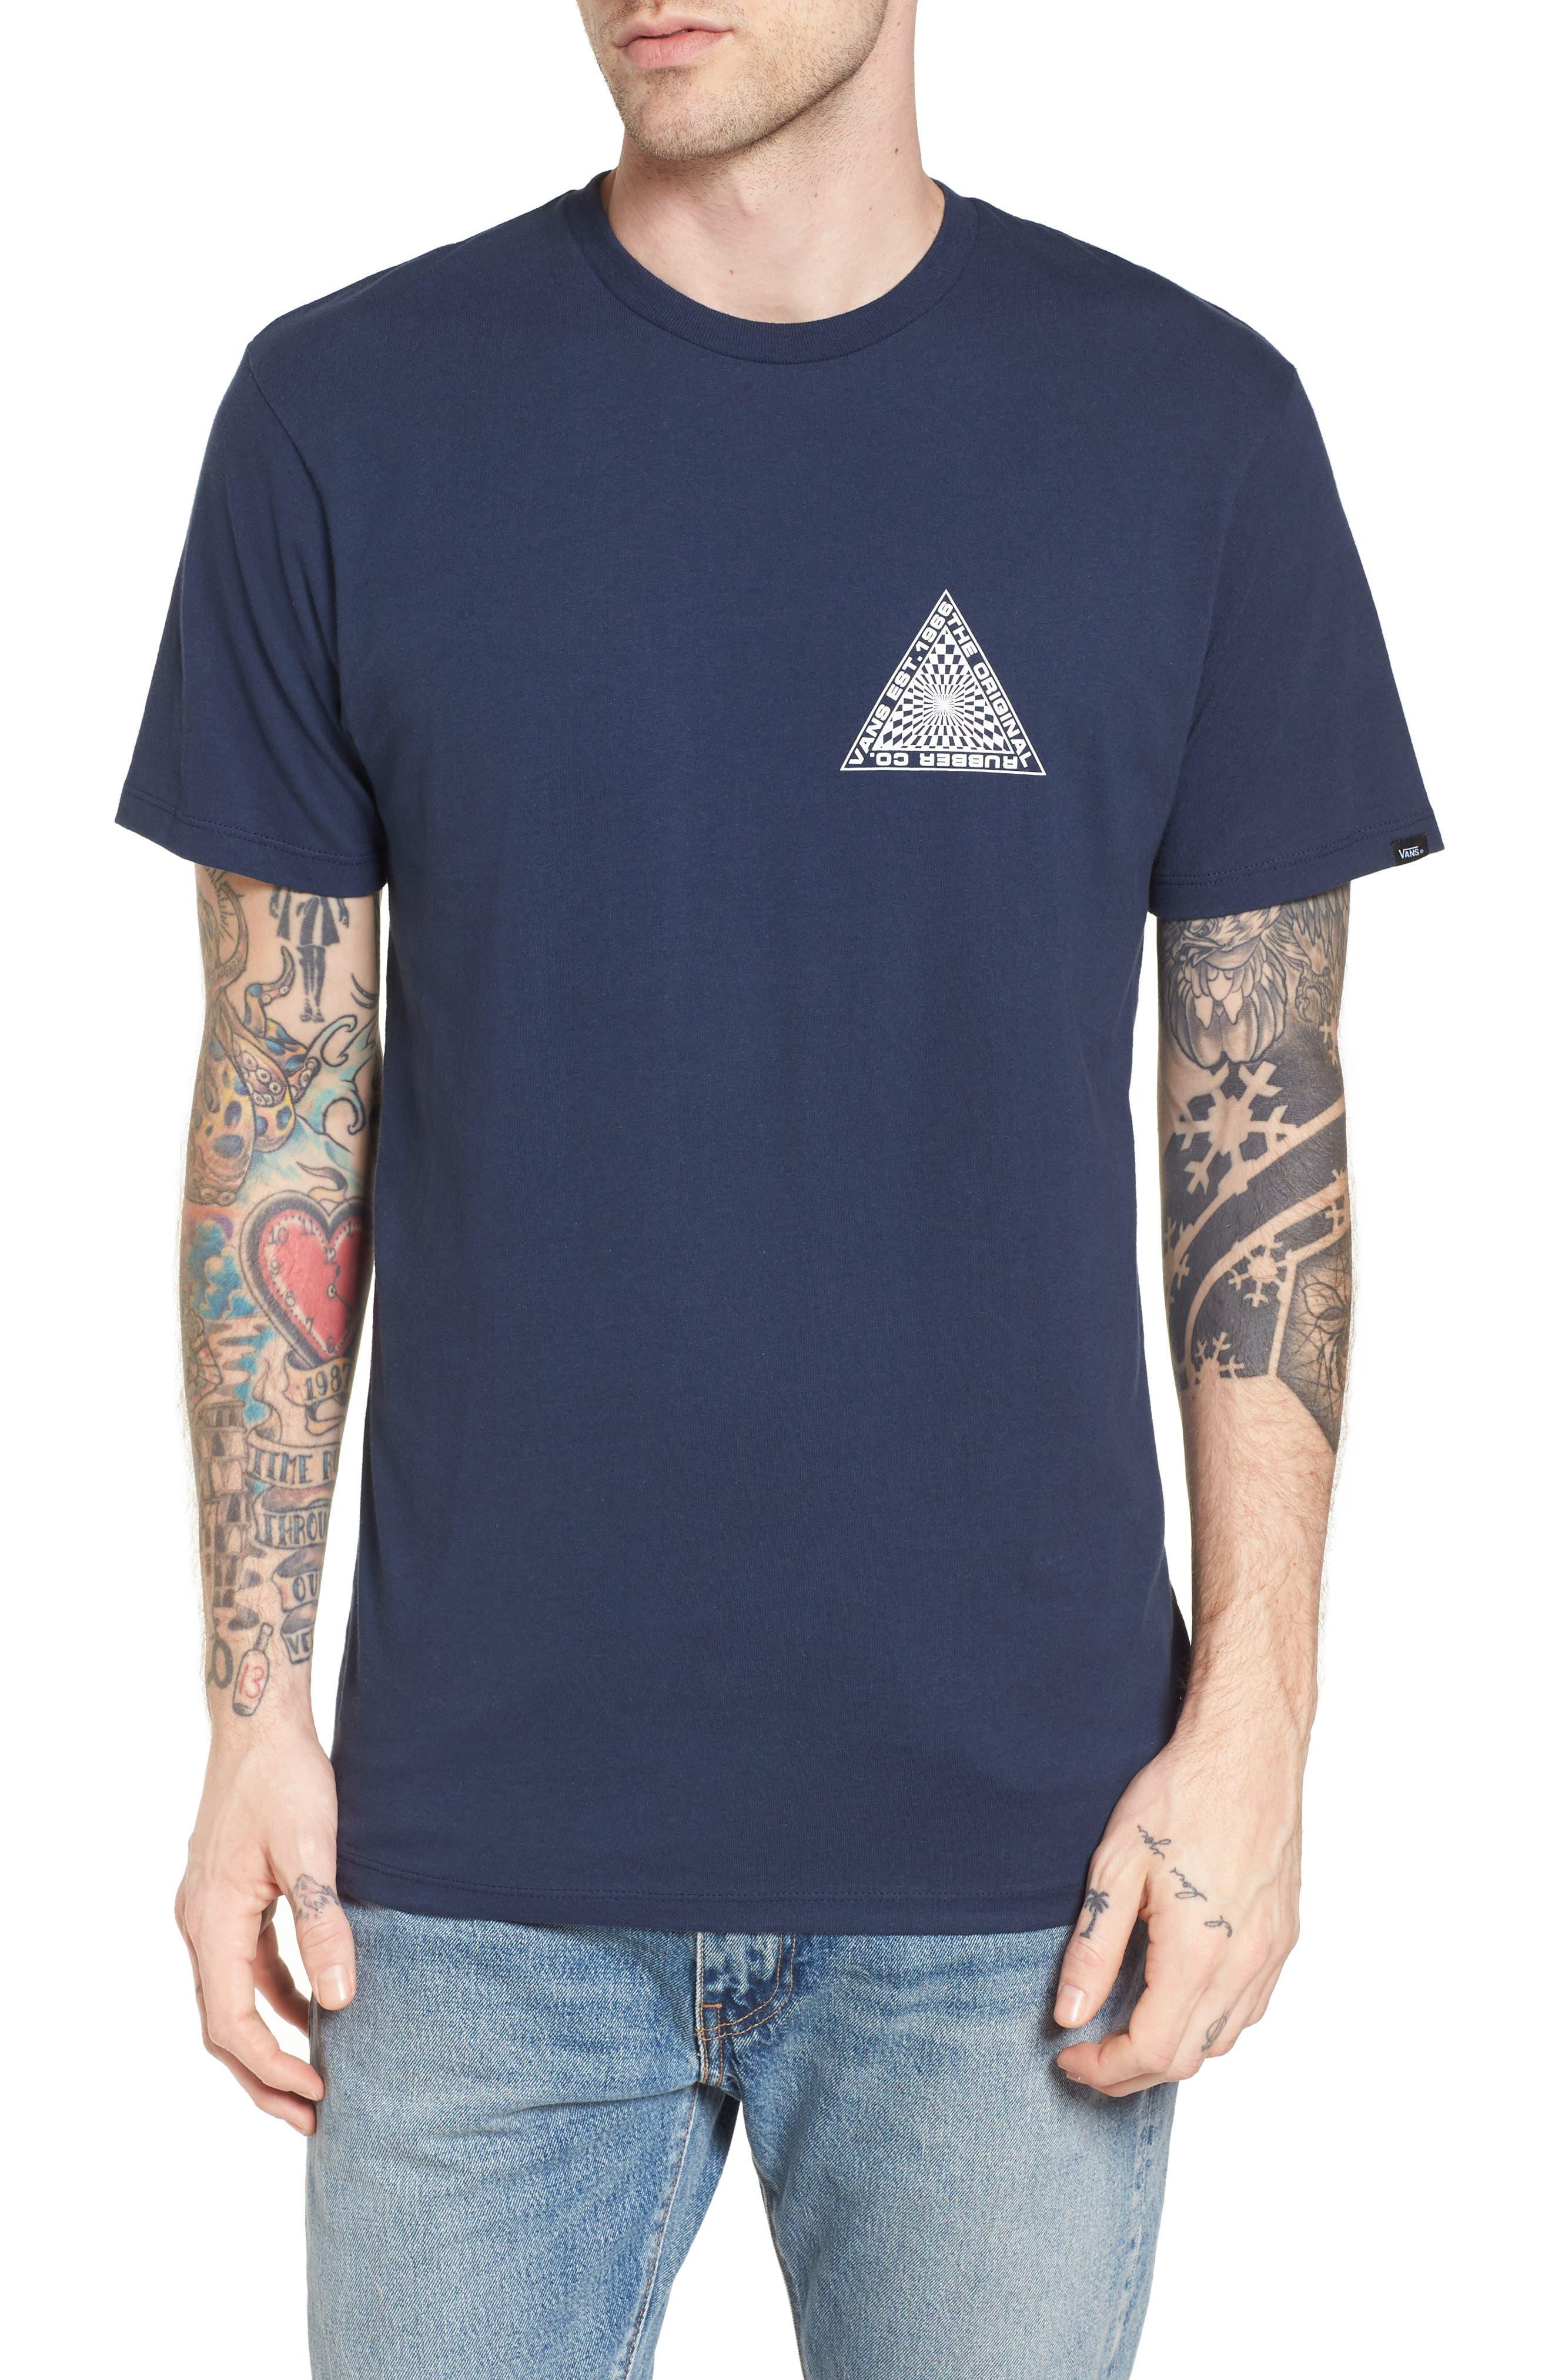 Main Image - Vans Hypnotics T-Shirt